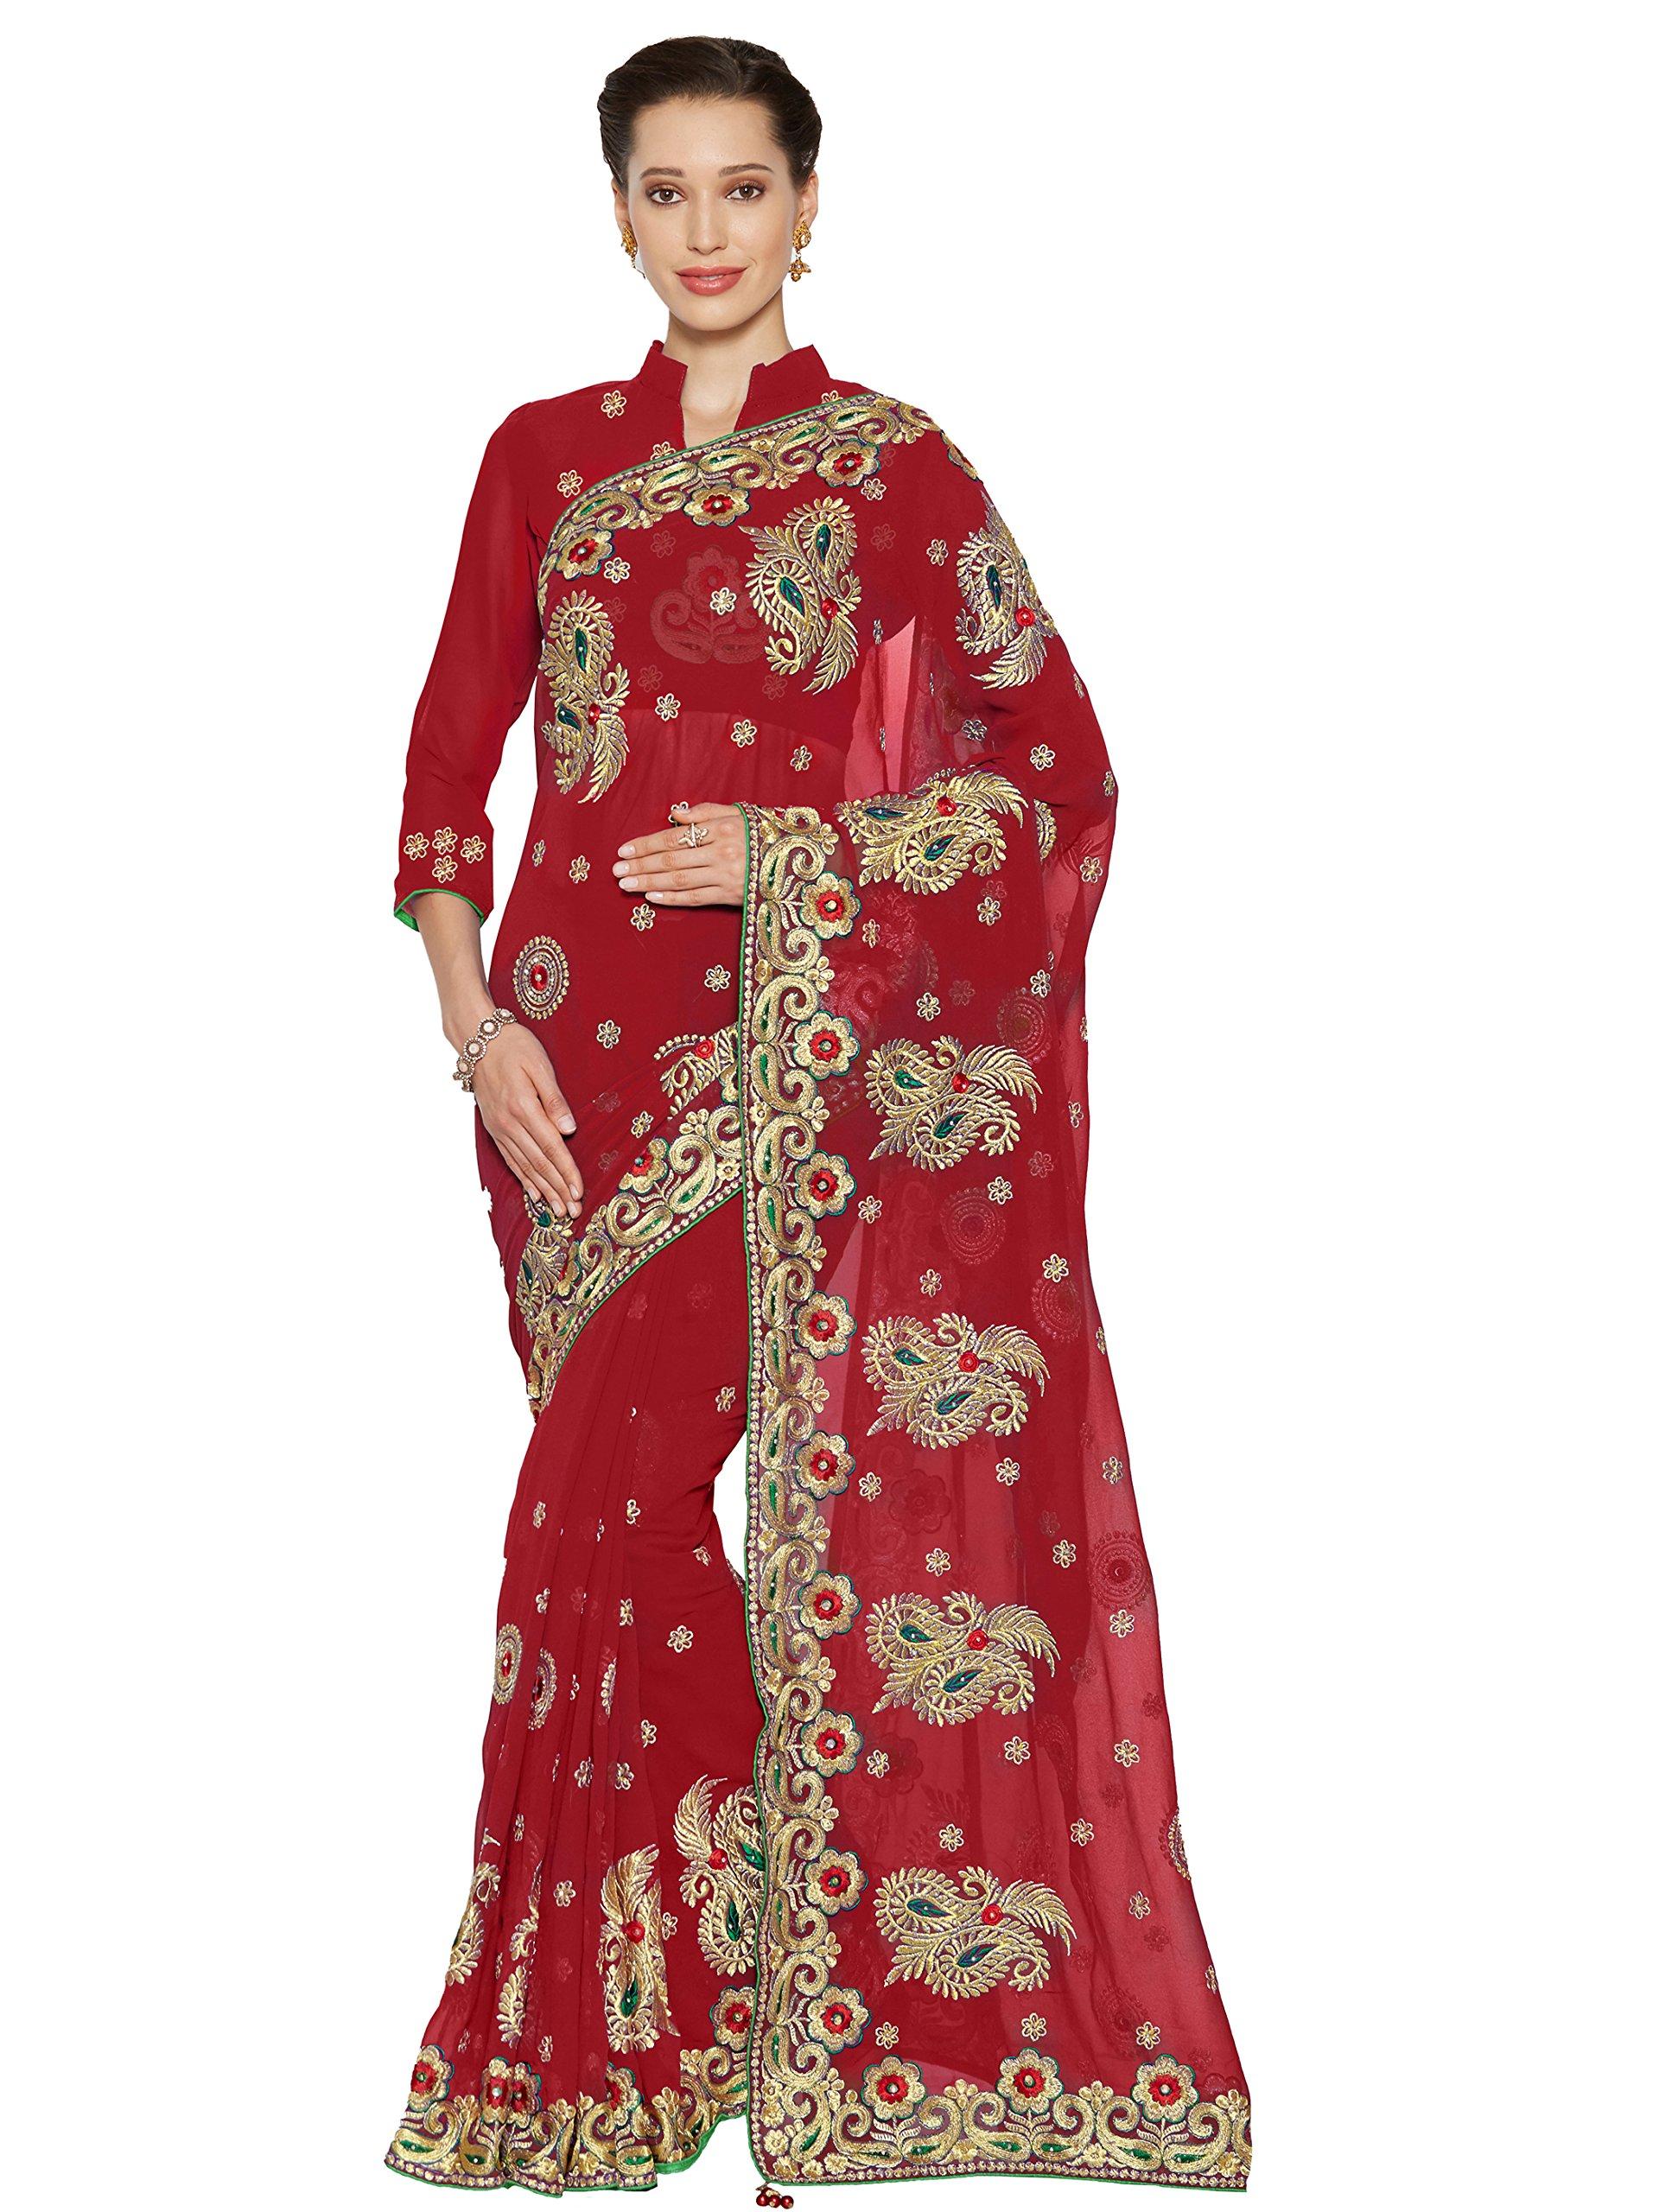 Sourbh Mirchi Fashion Women's Faux Georgette Bridal Wedding Saree (4071_Red)